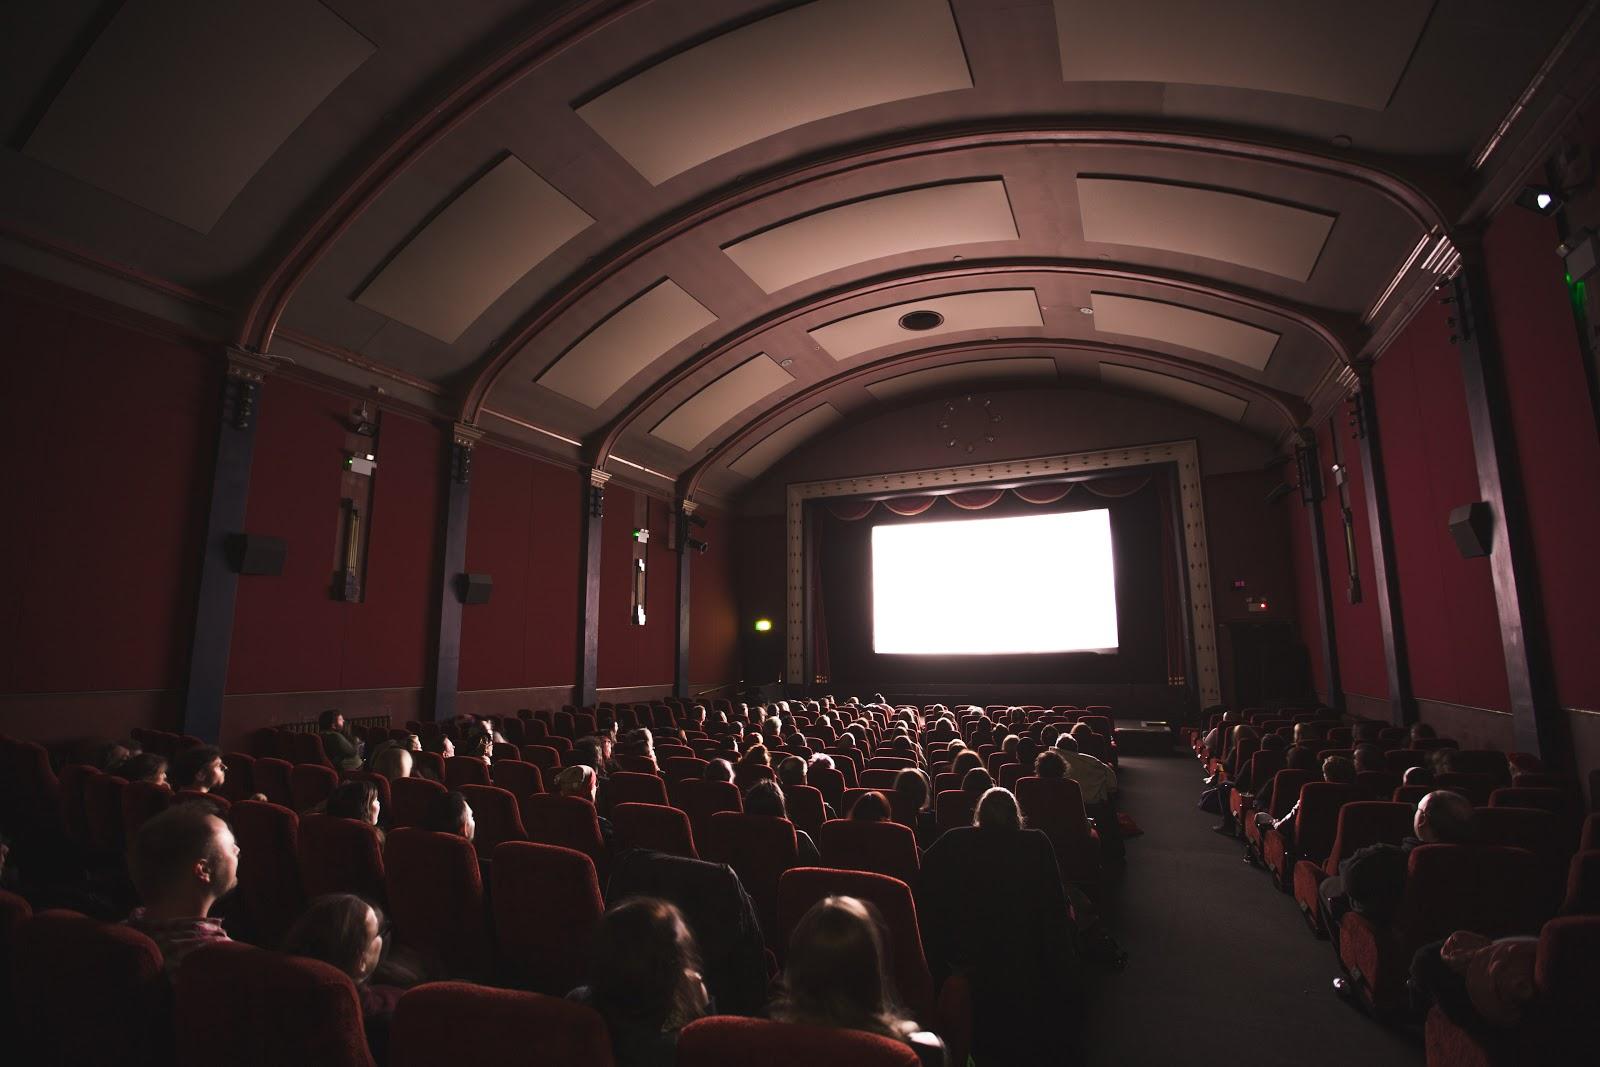 Understanding the Audience's Reception